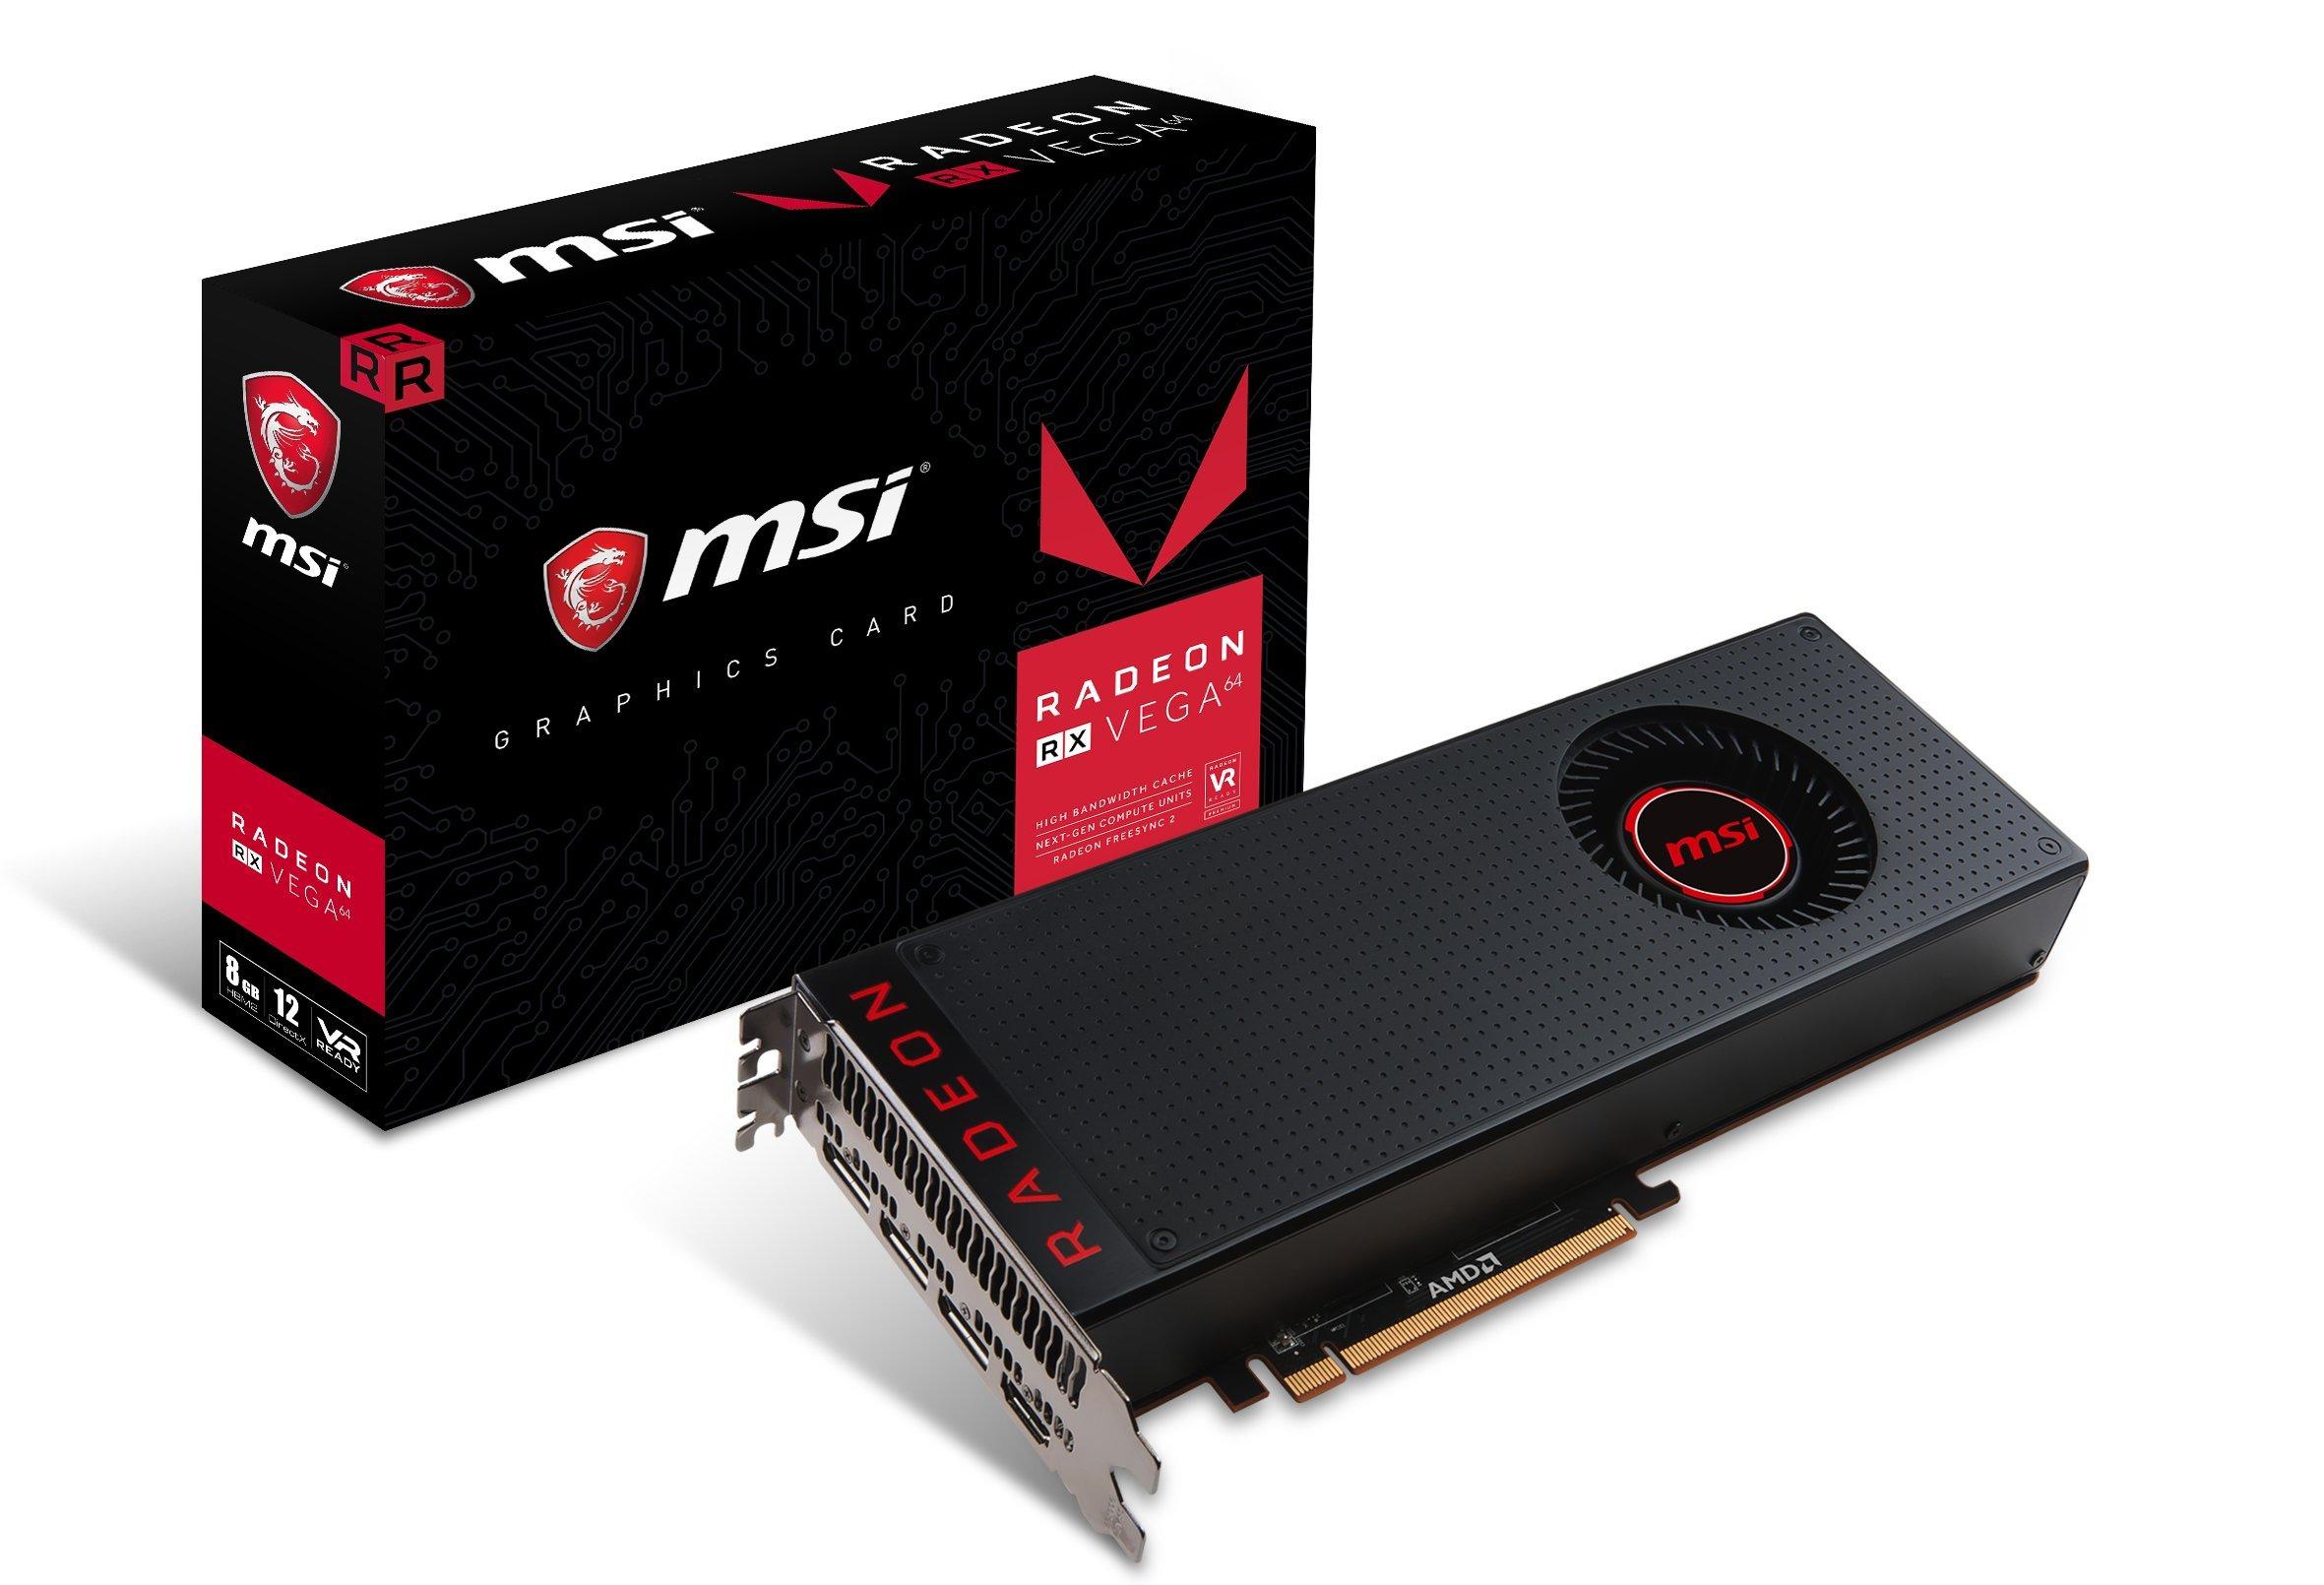 MSI NVIDIA Graphics Card v803-870r